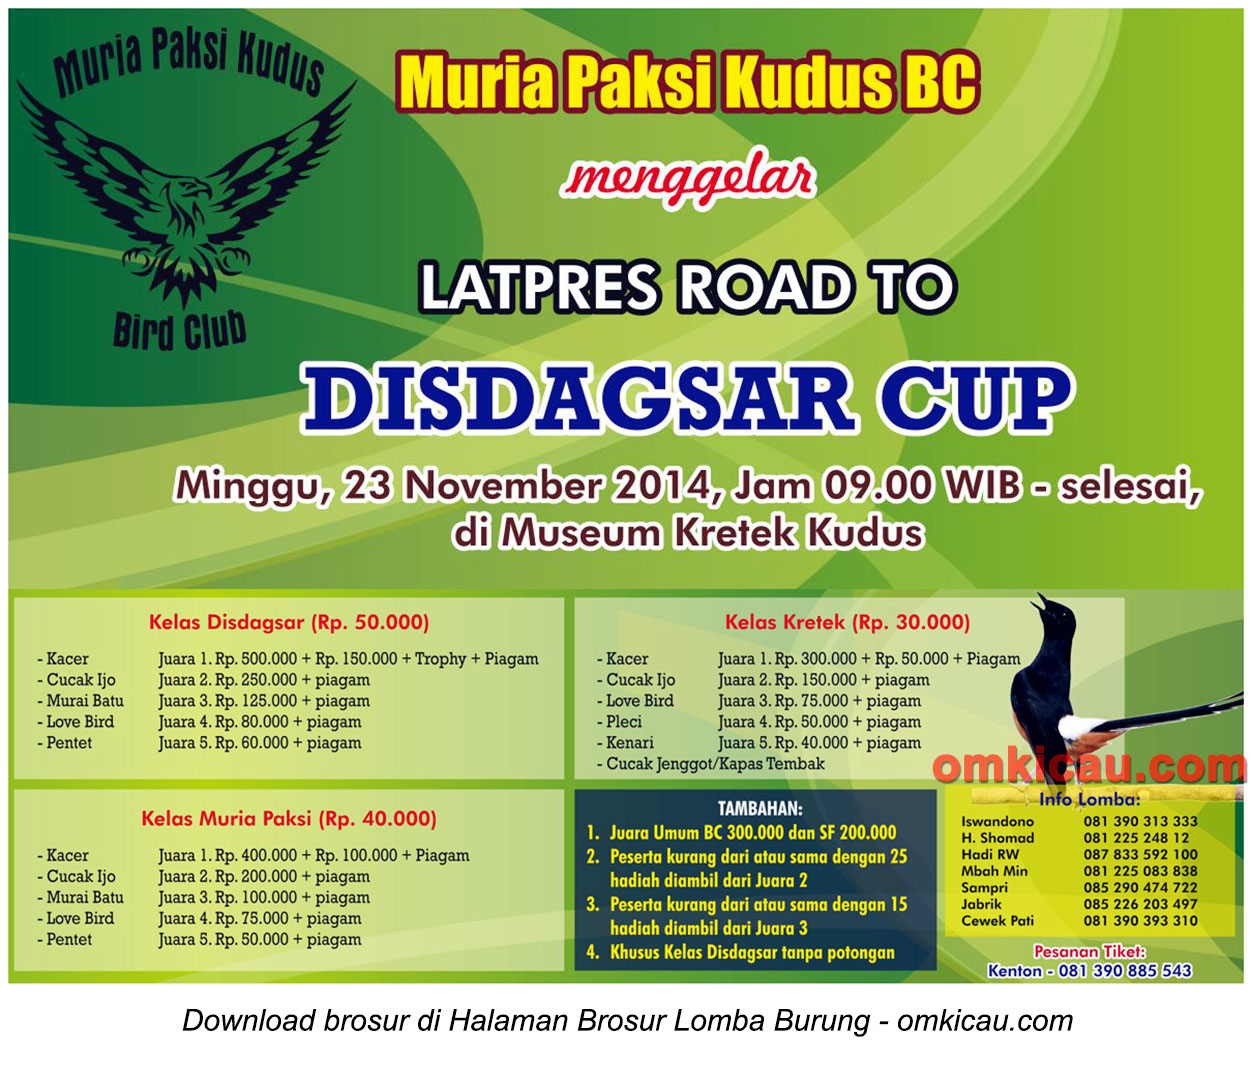 Brosur Latpres Road to Disdagsar Cup, Kudus, 23 November 2014